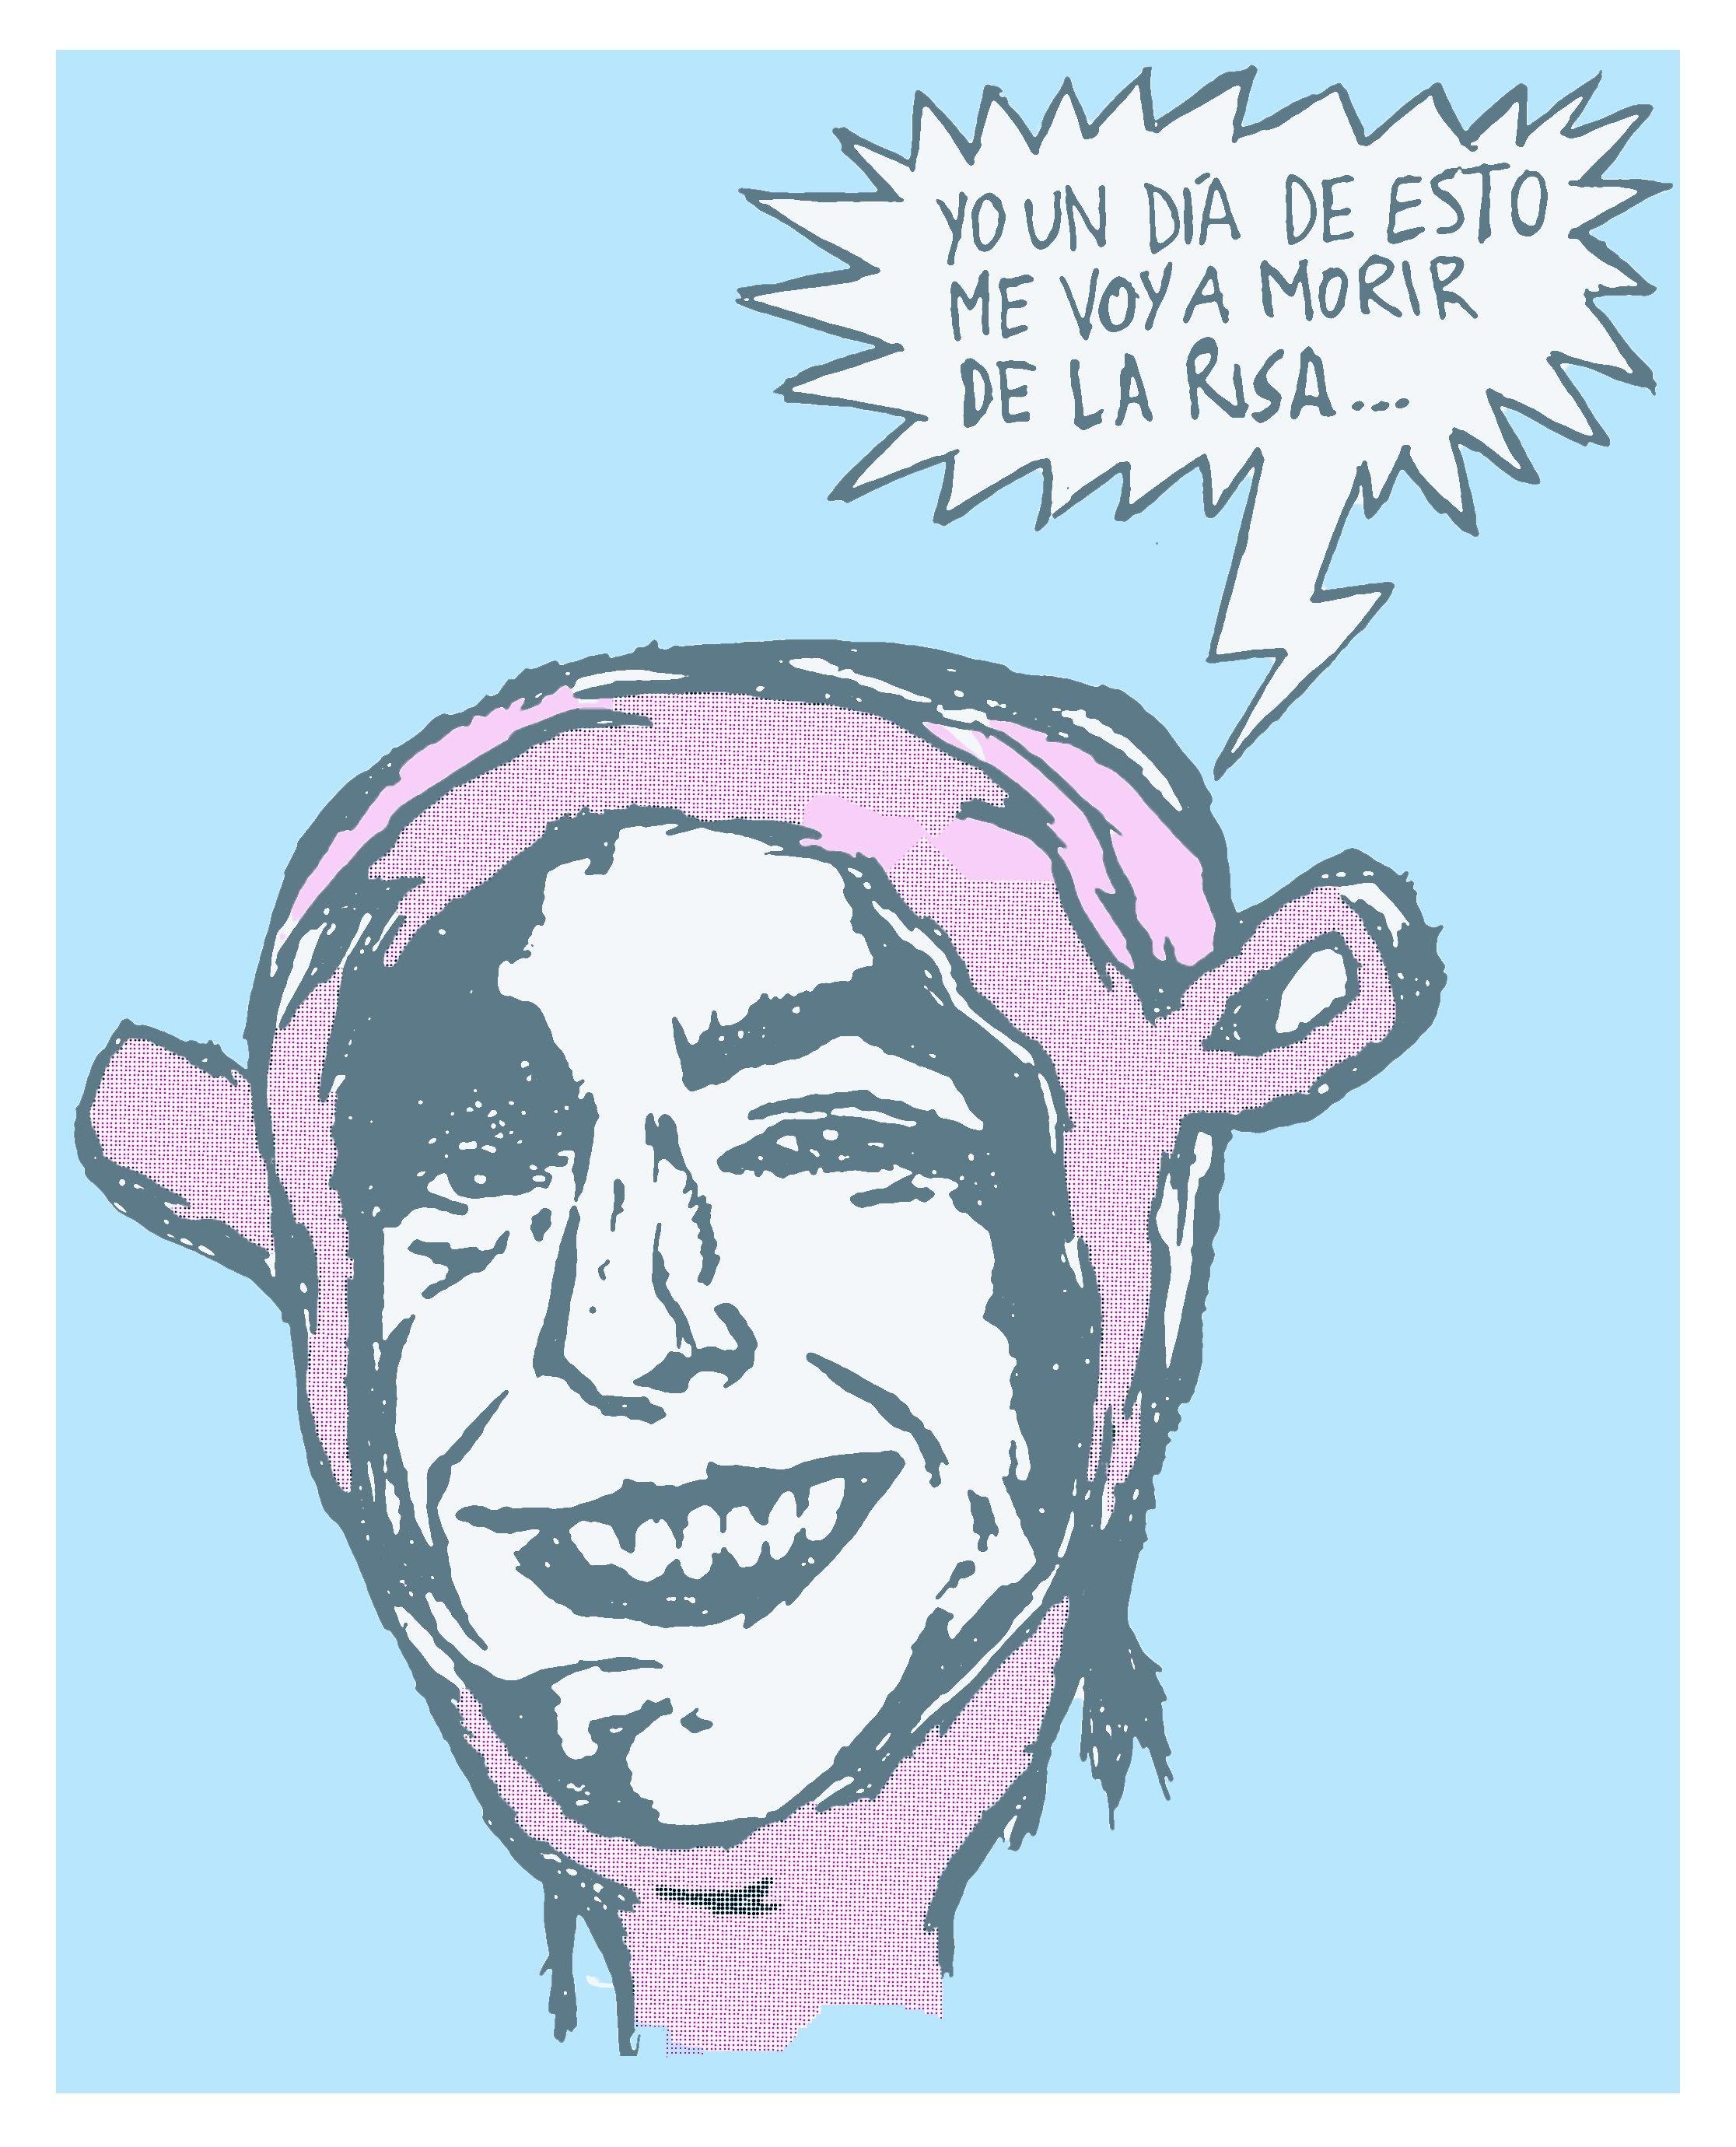 caricatura de mi amigo Mateo!